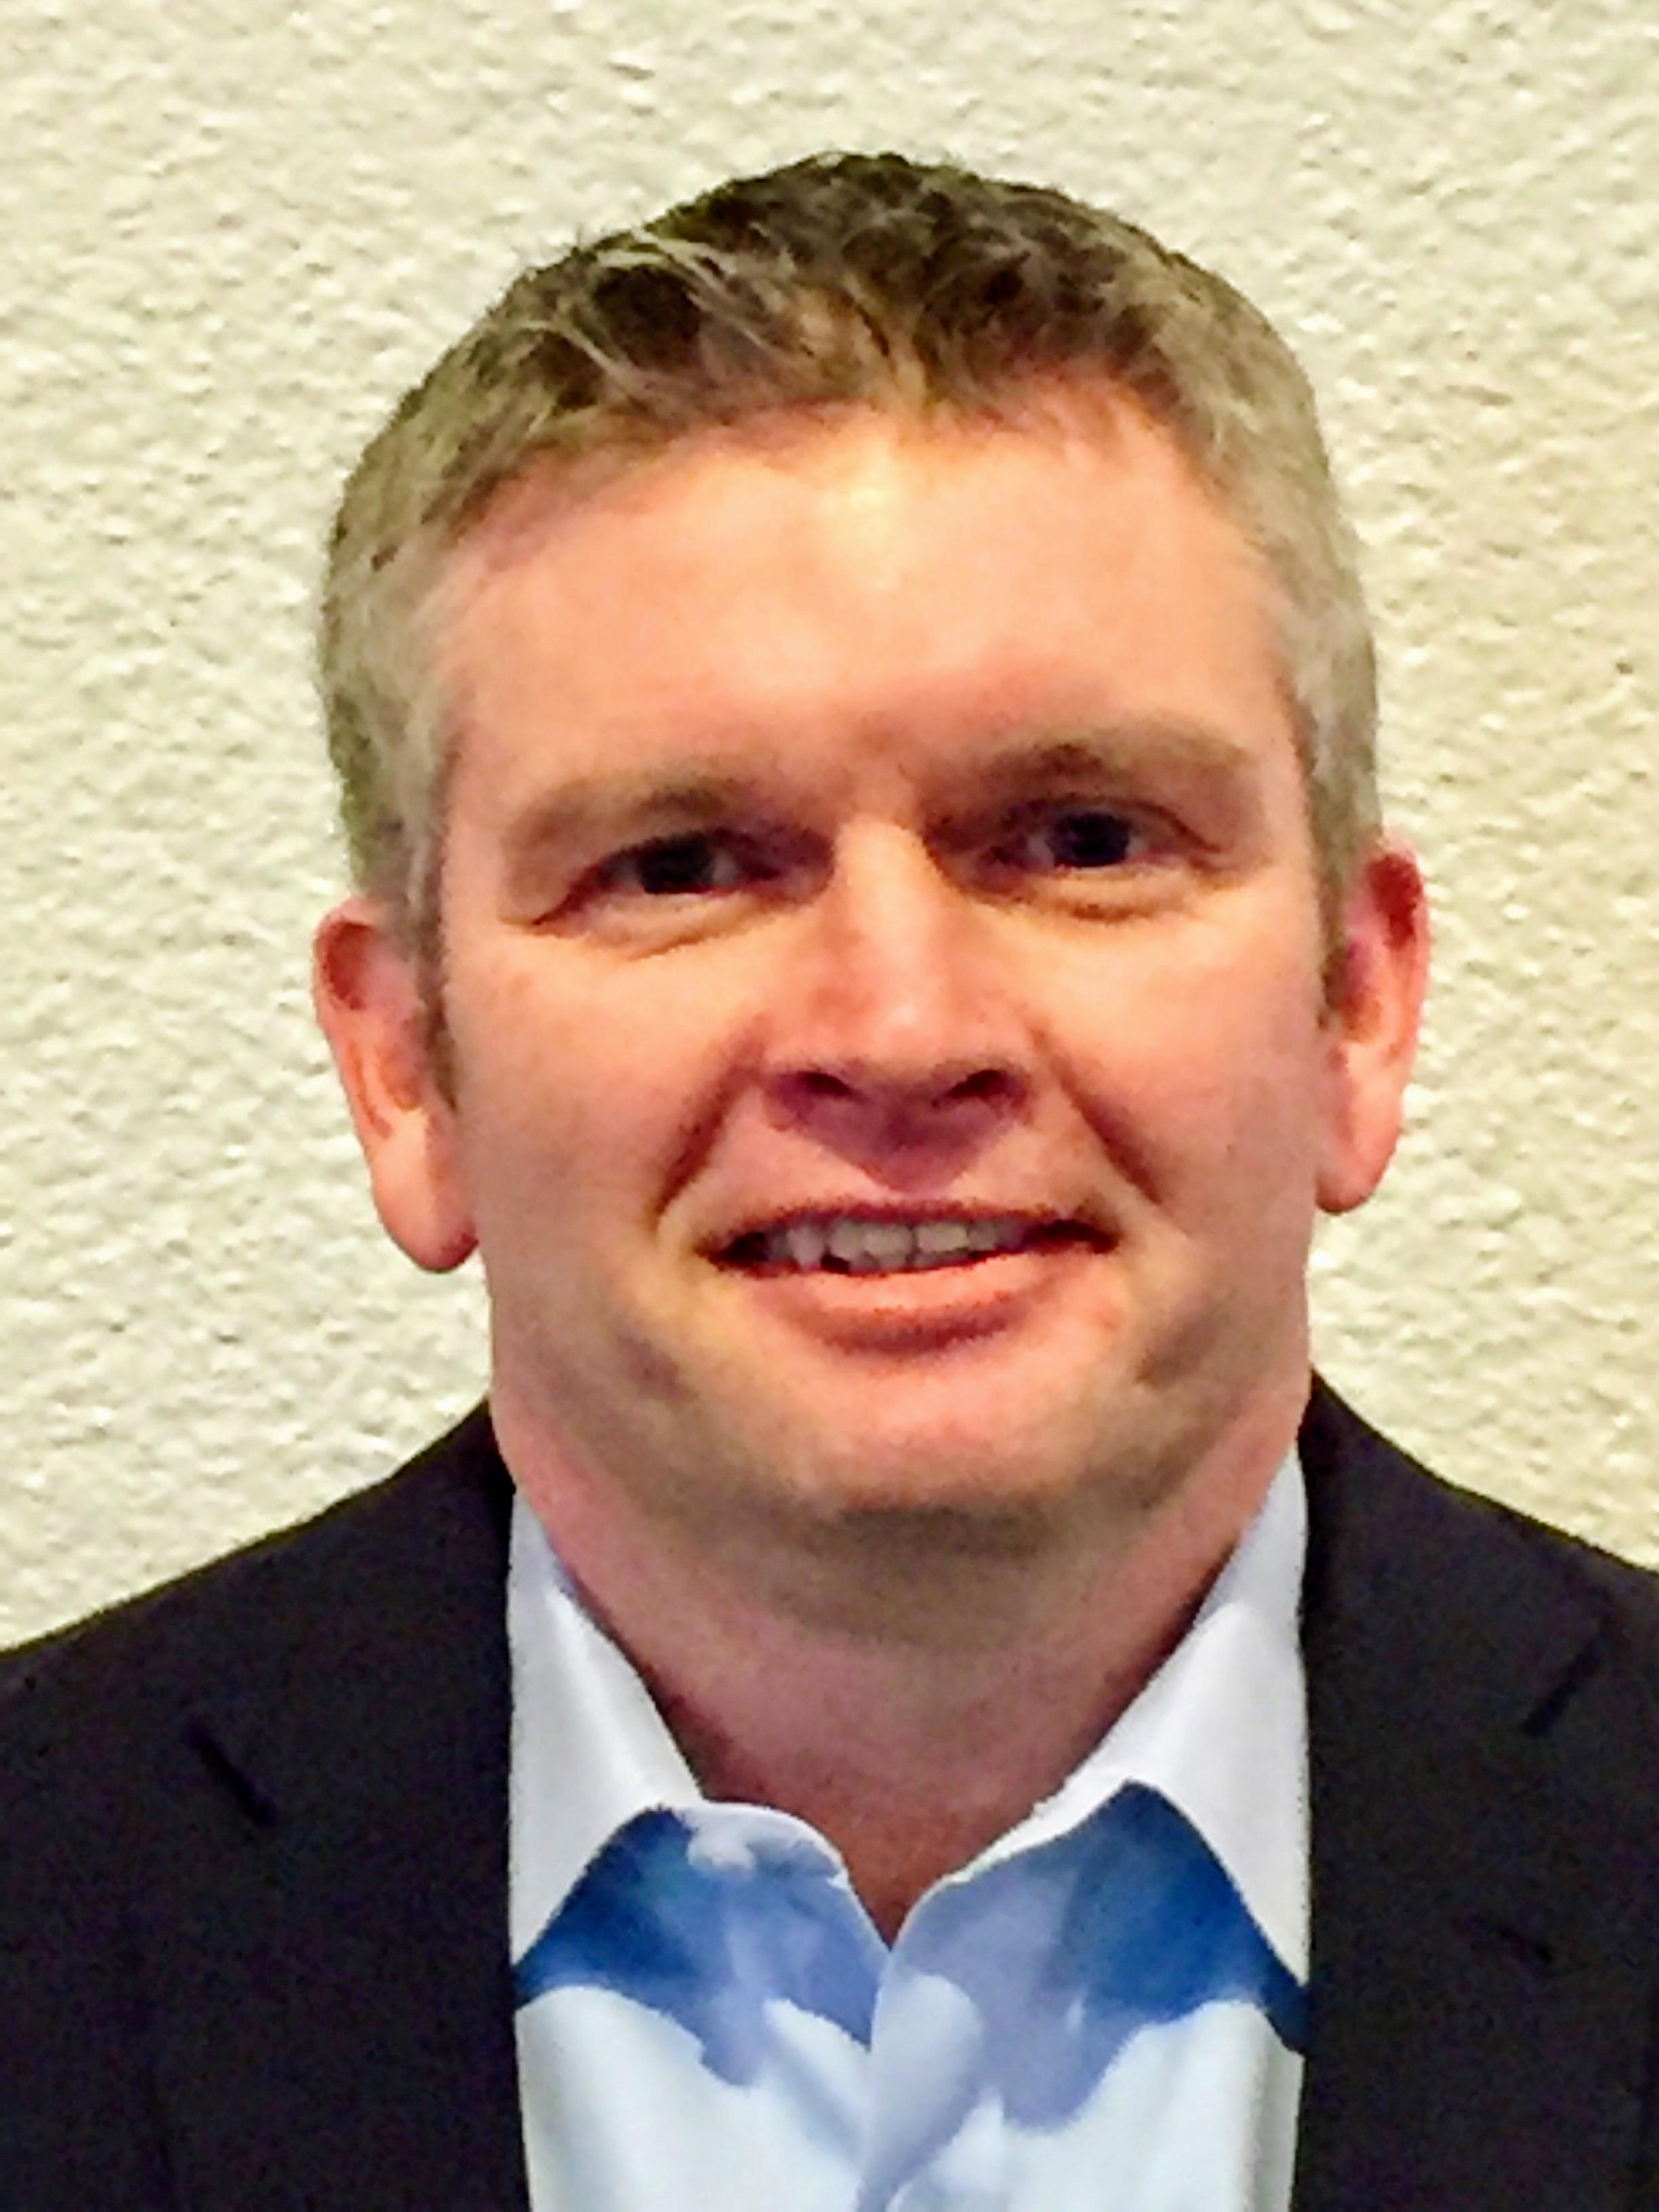 Matthew Kimble <br><br/> Portfolio Manager <br> Avenue U.S. Strategy